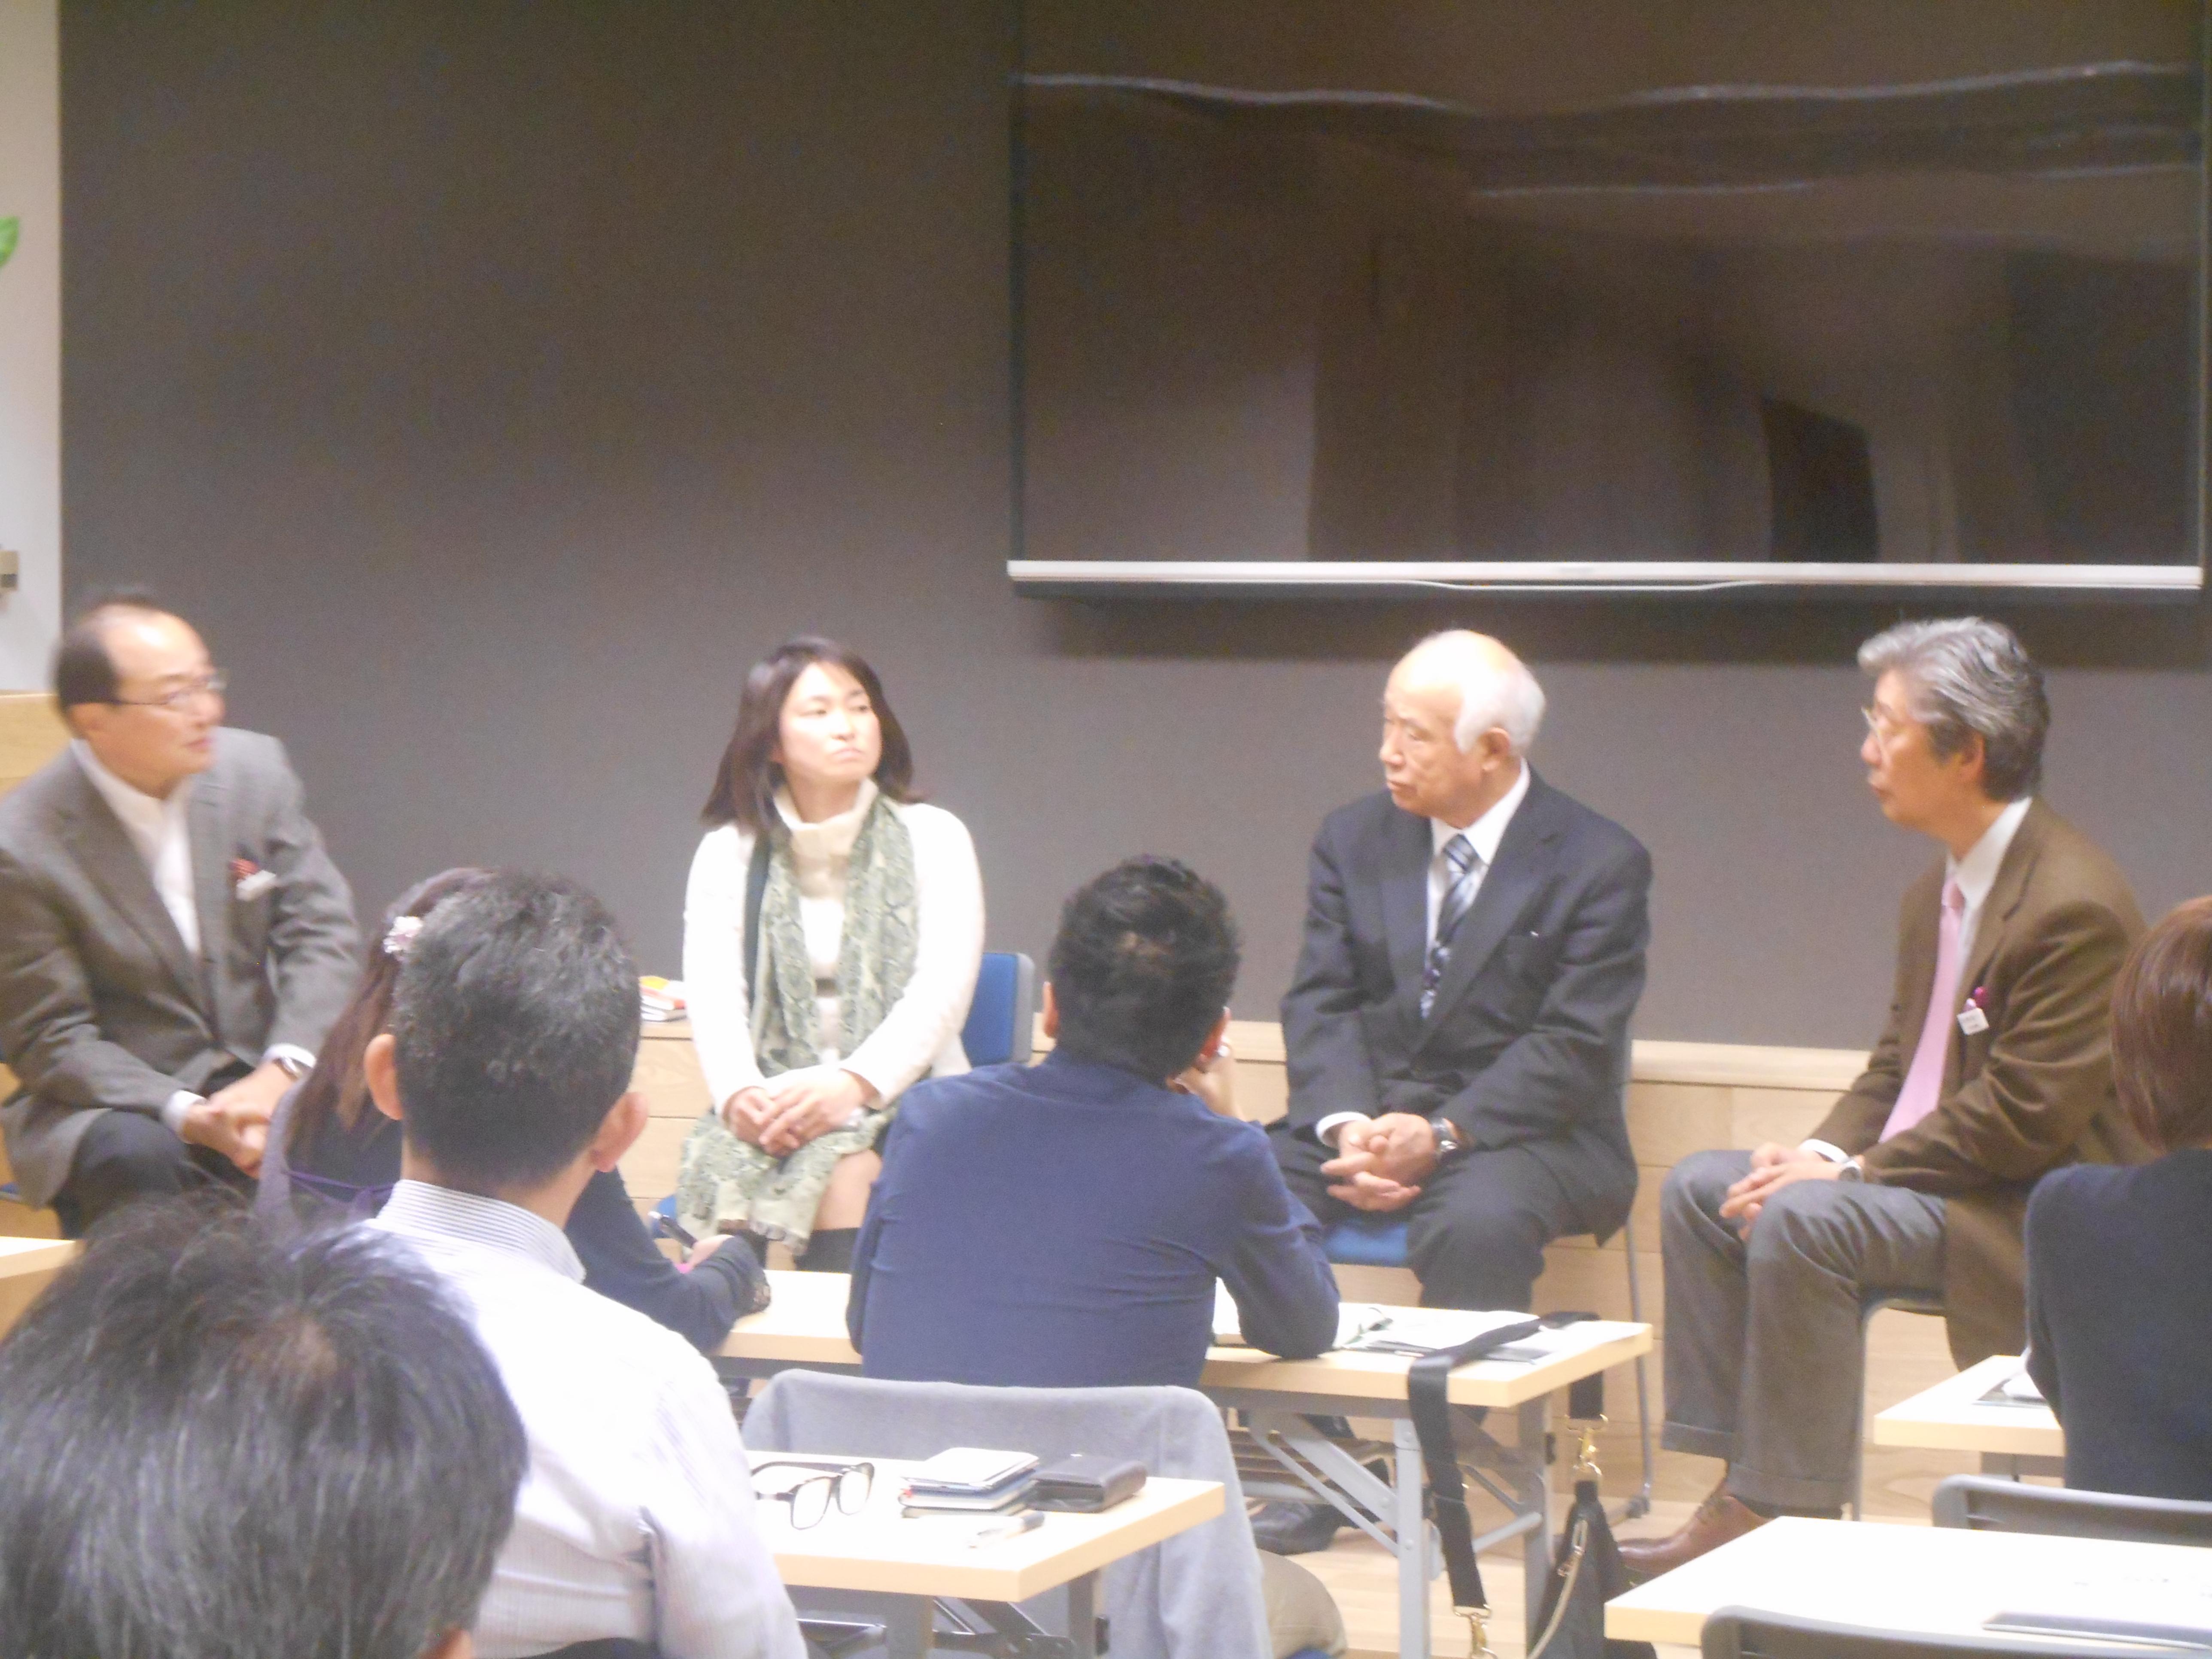 DSCN0475 - 2017年2月4日東京思風塾開催